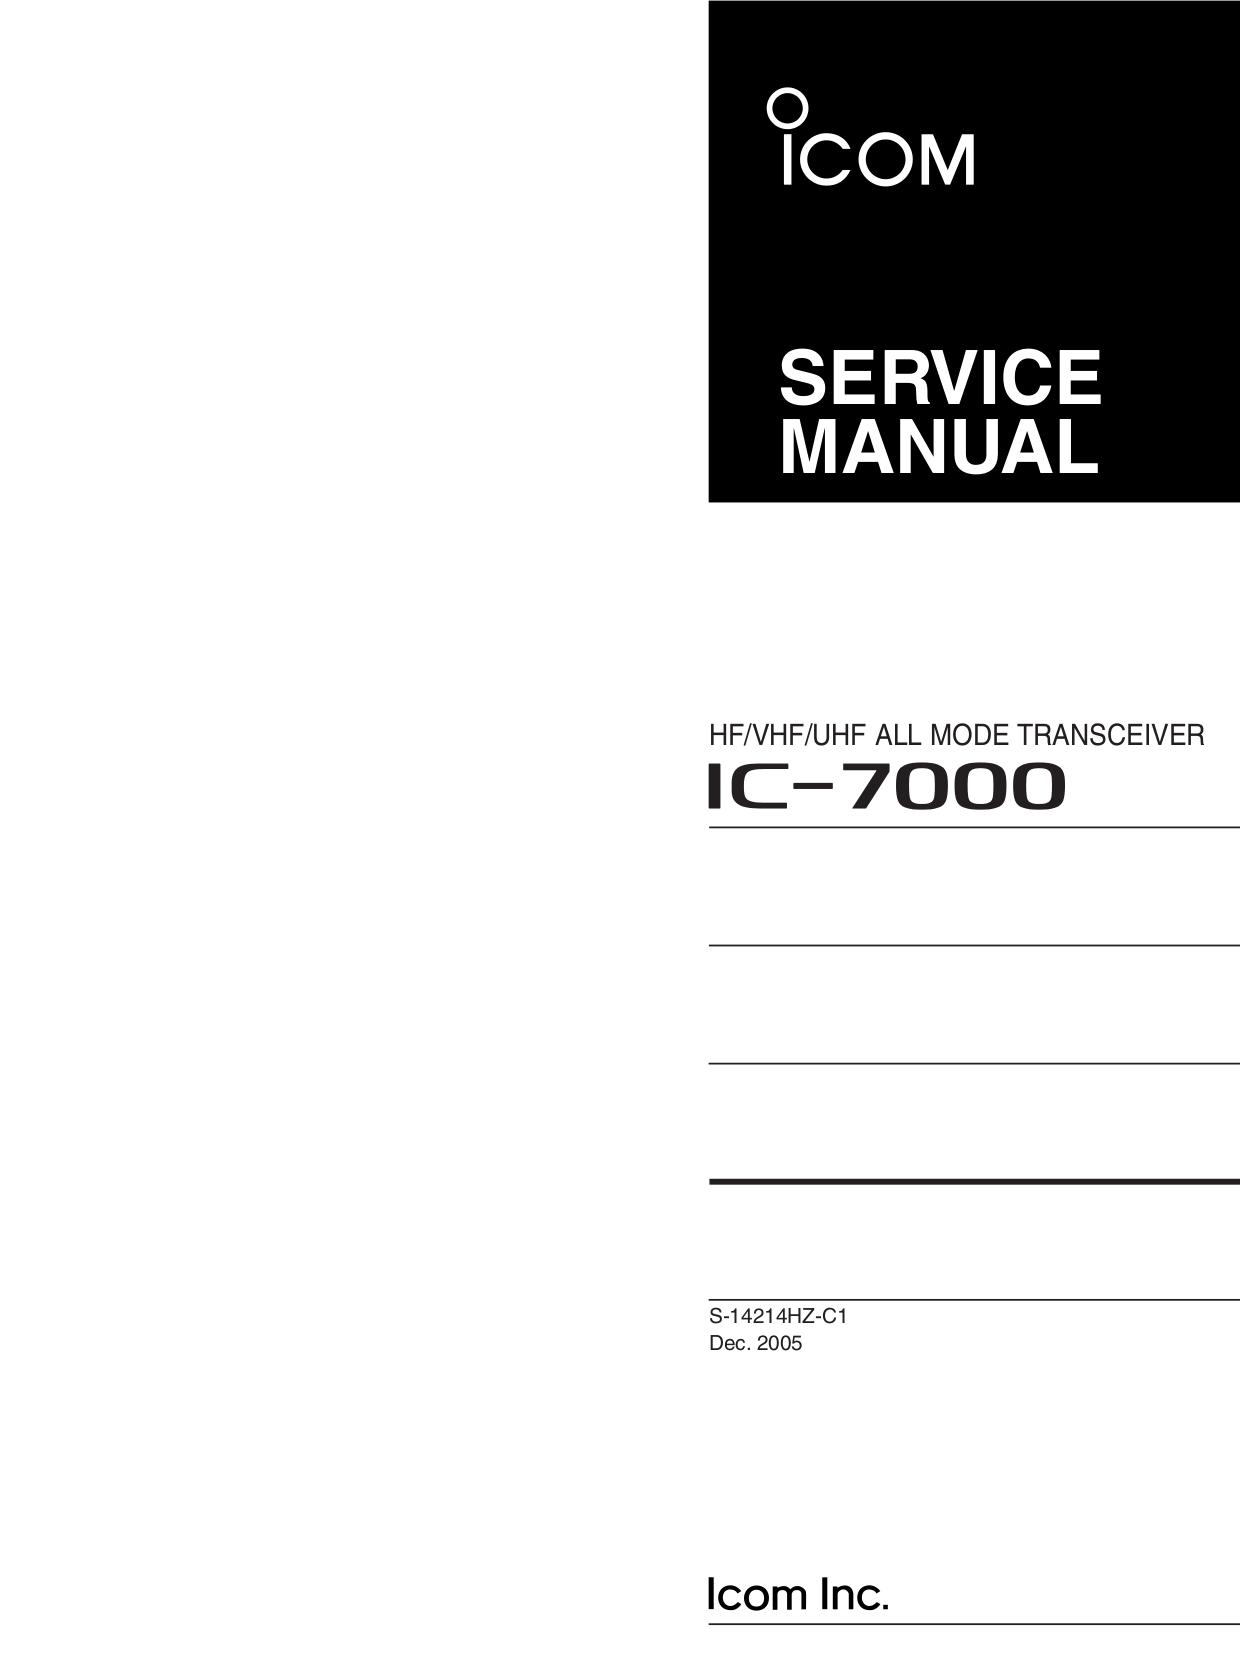 lg air conditioner service manual pdf